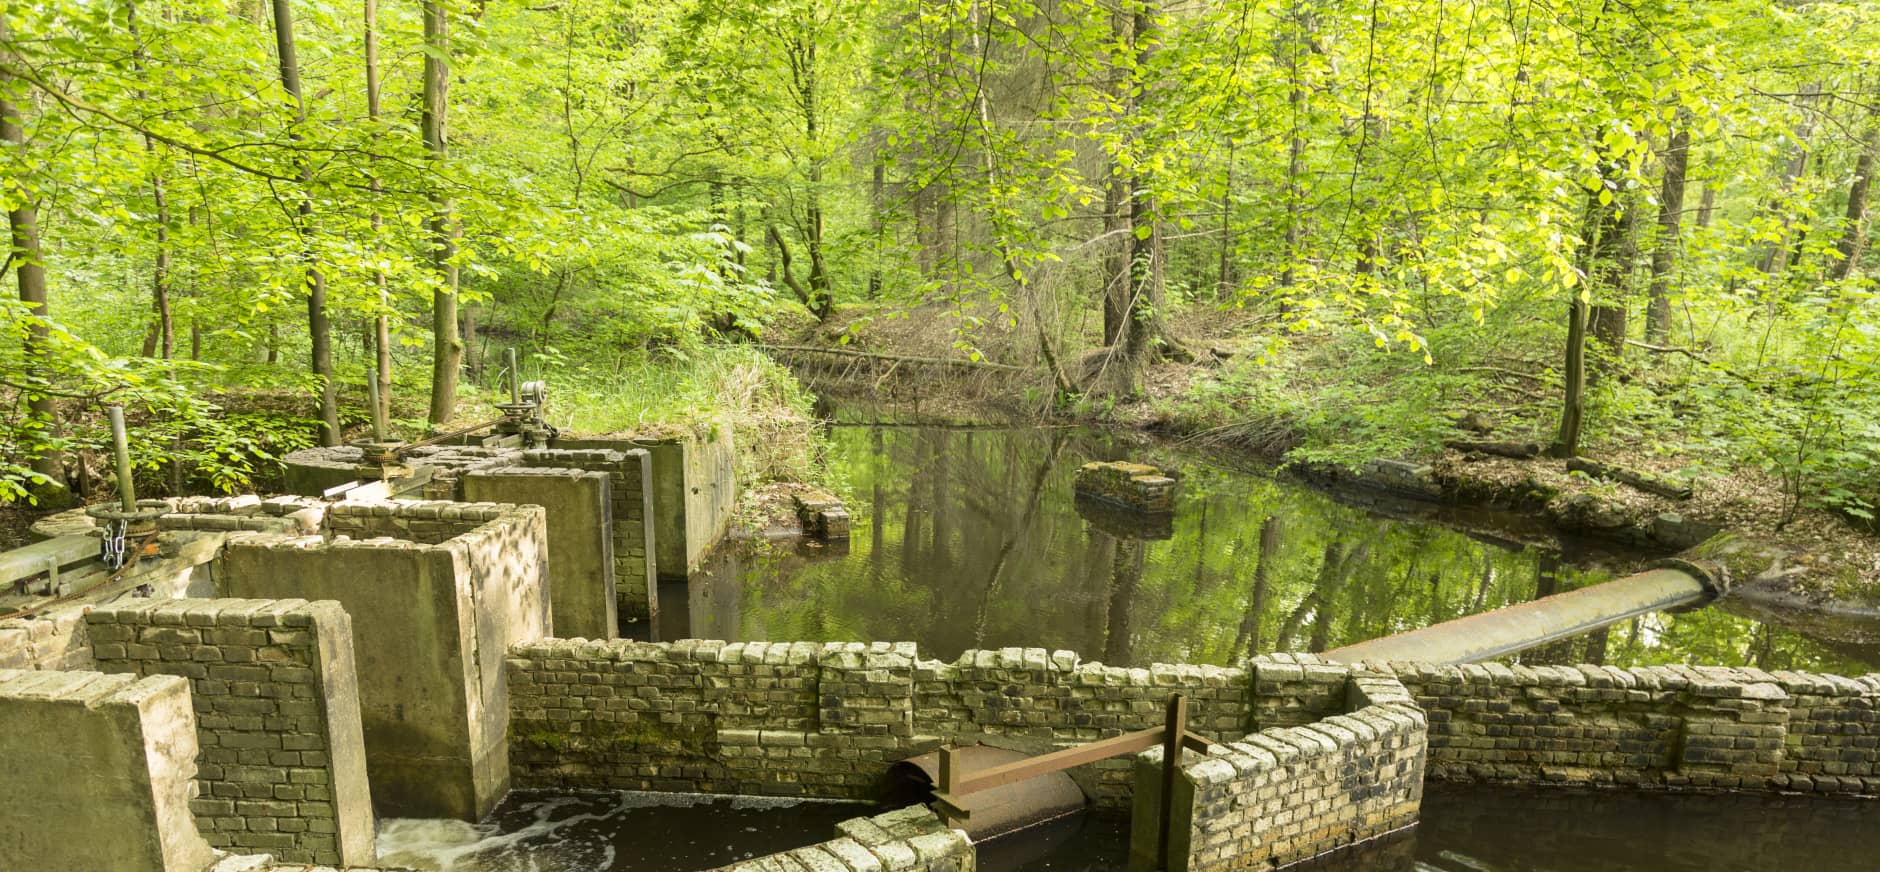 Groepsexcursie Waterloopbos- Wandelen met waterbouwkundig gids